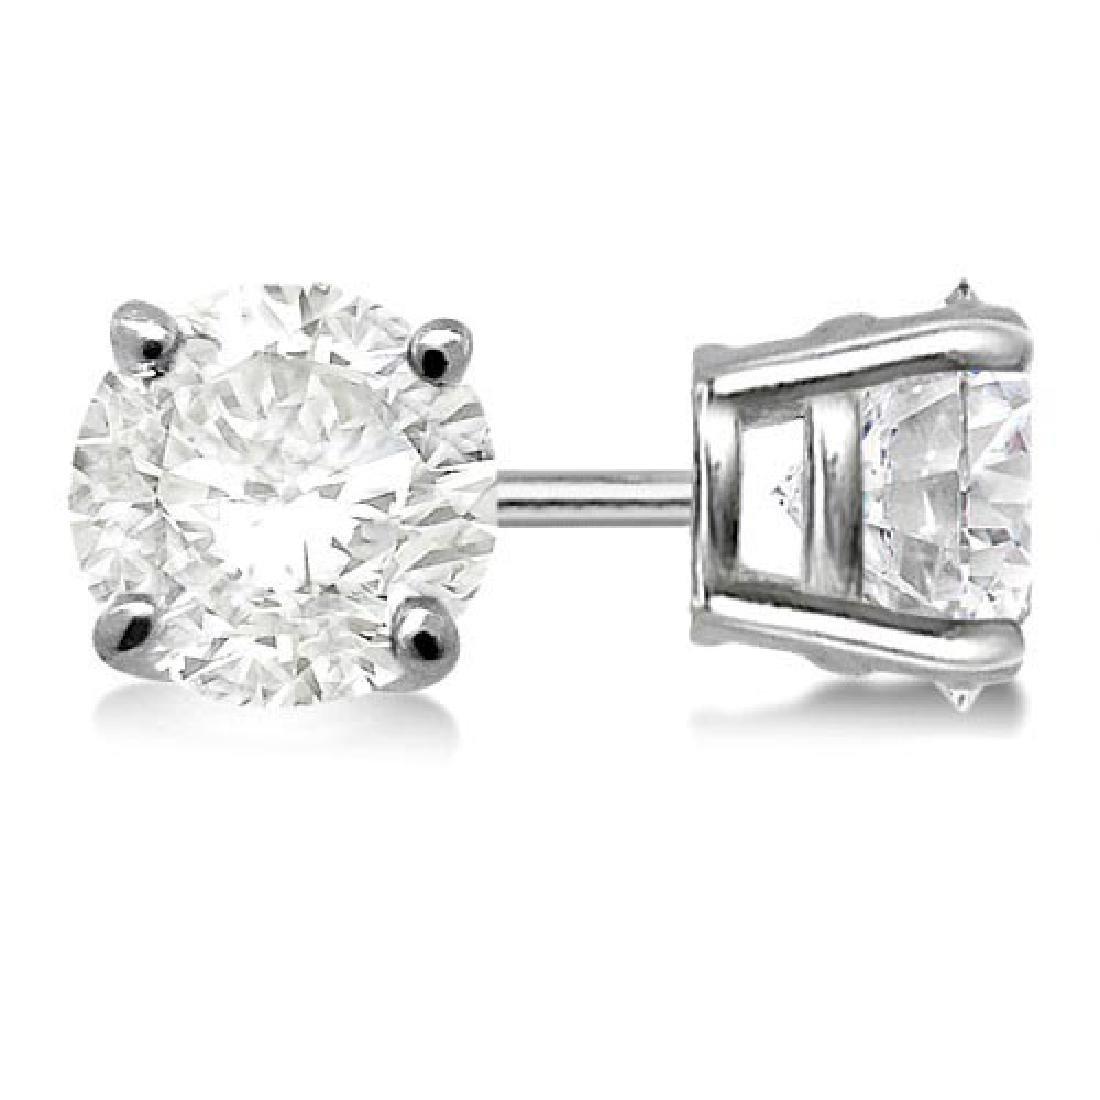 Certified 1.28 CTW Round Diamond Stud Earrings E/I2